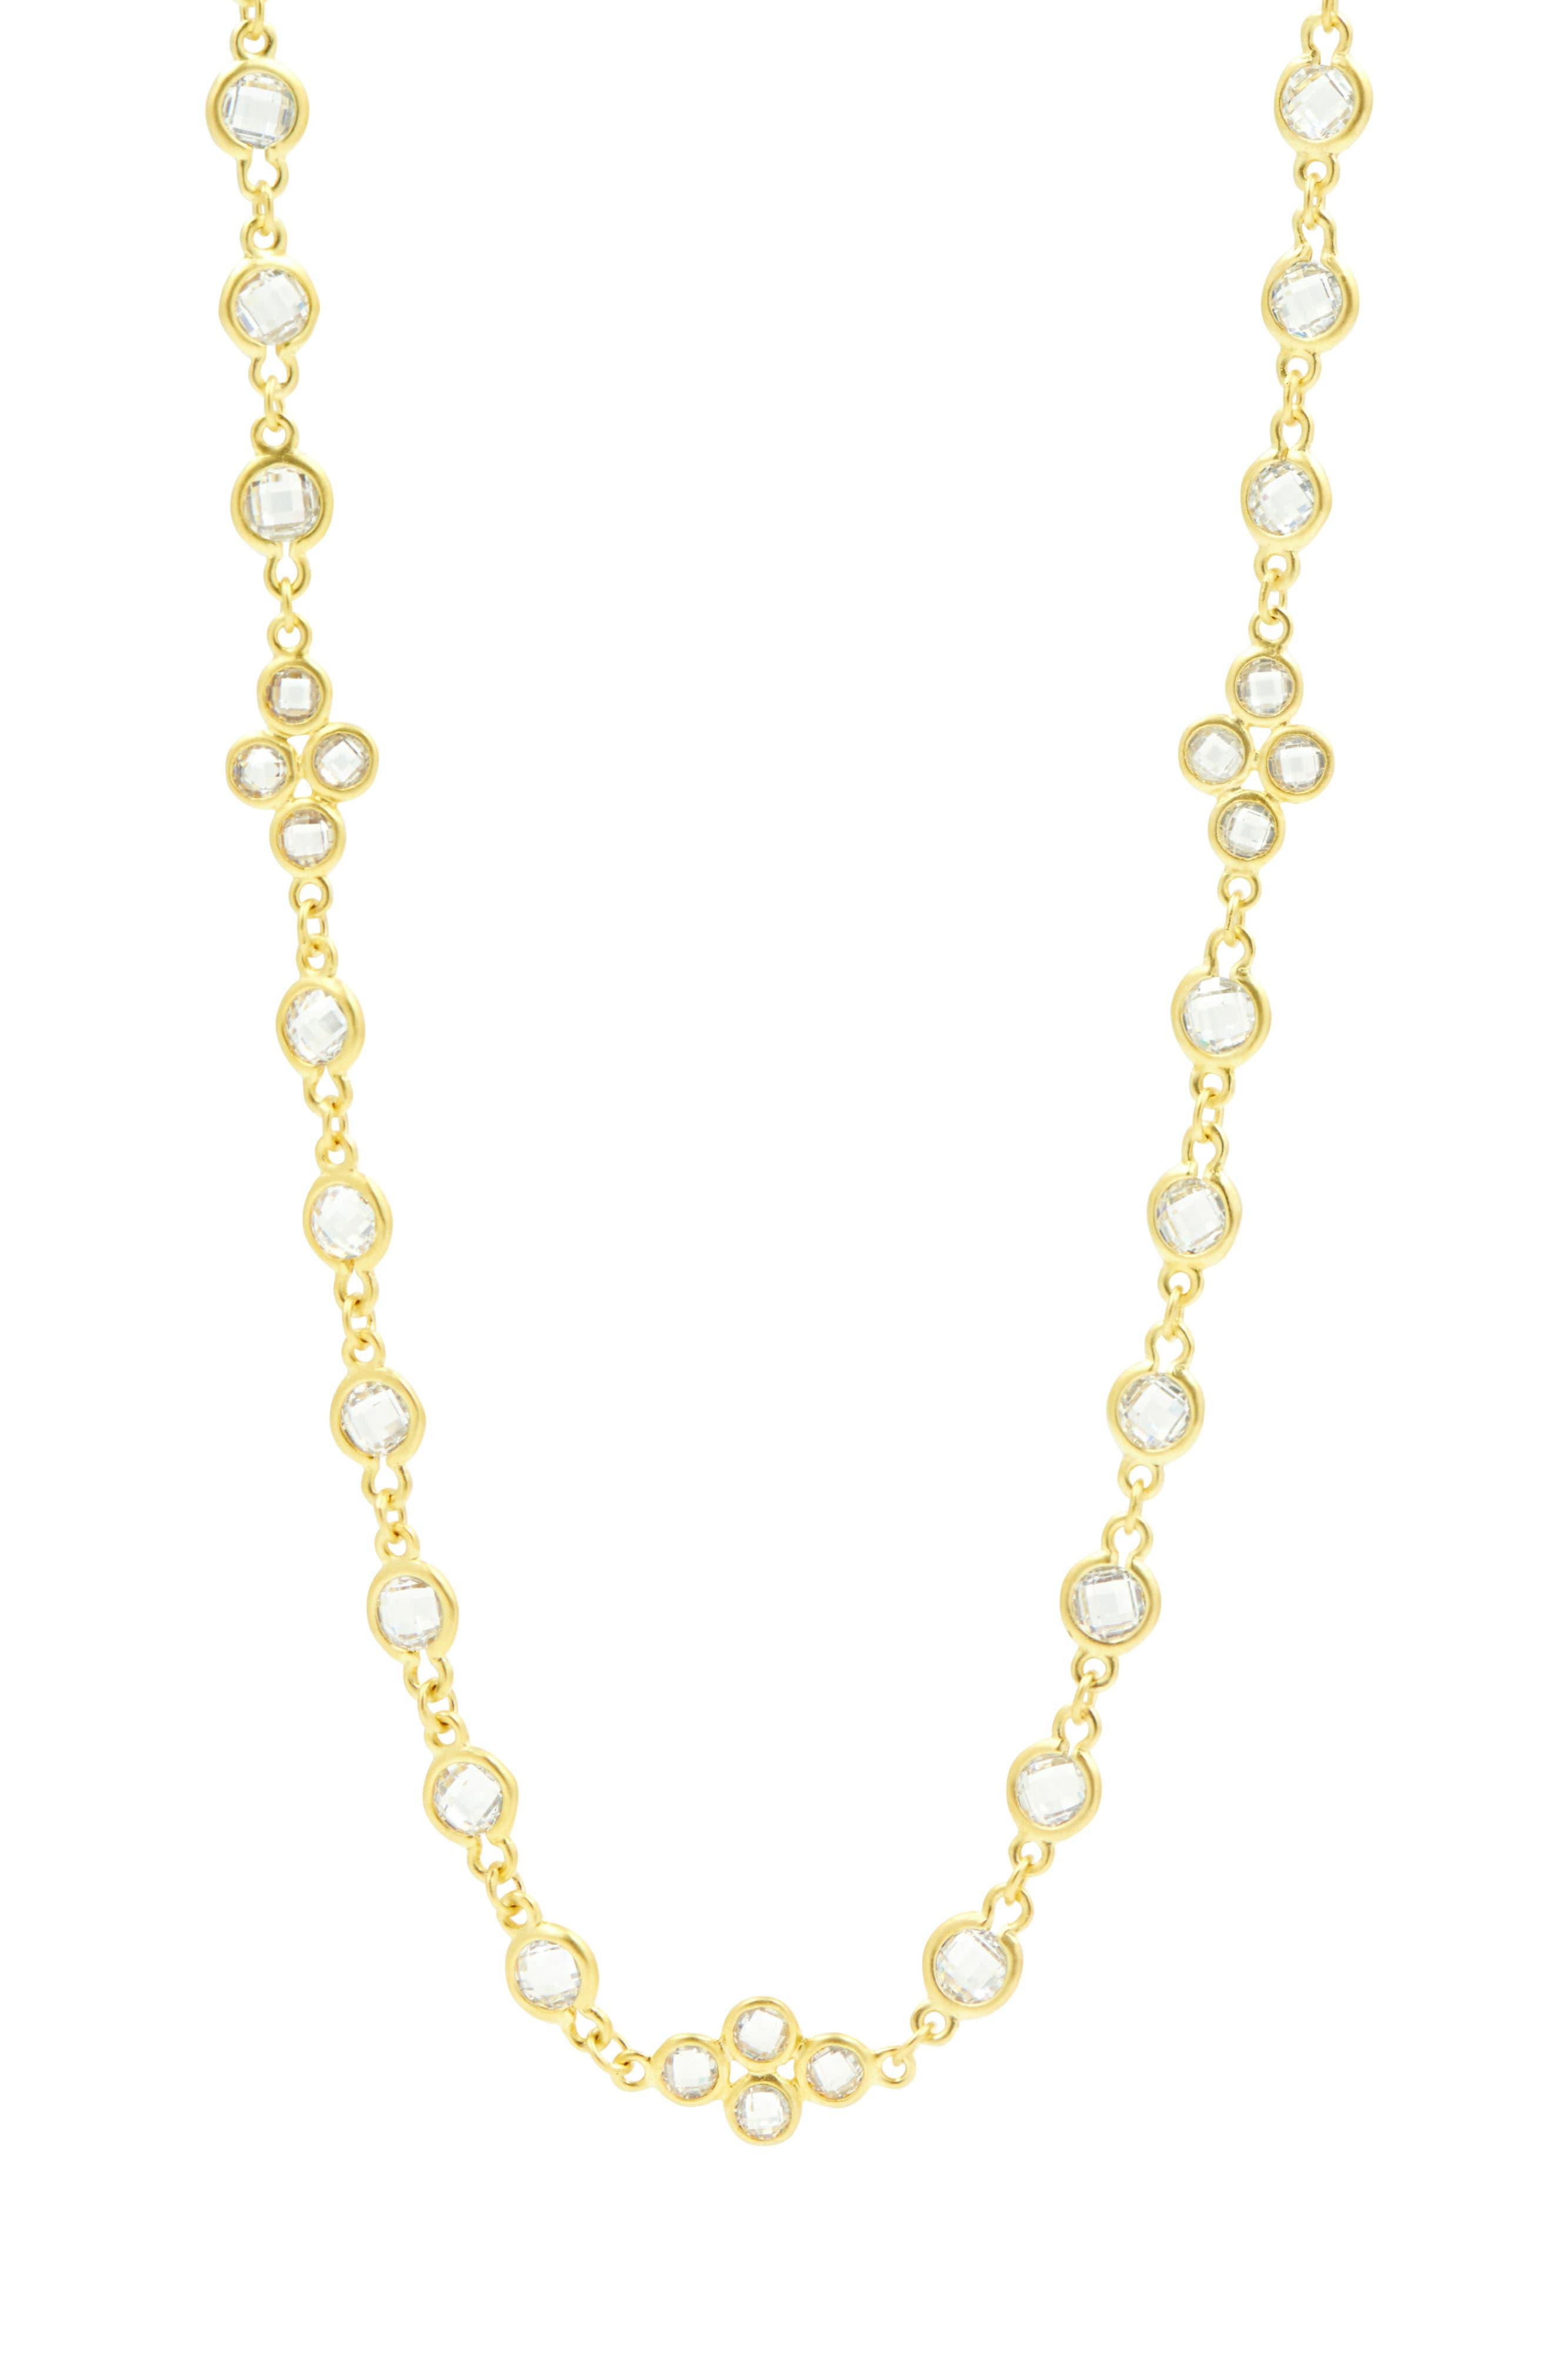 Cubic Zirconia Necklace,                             Alternate thumbnail 3, color,                             710